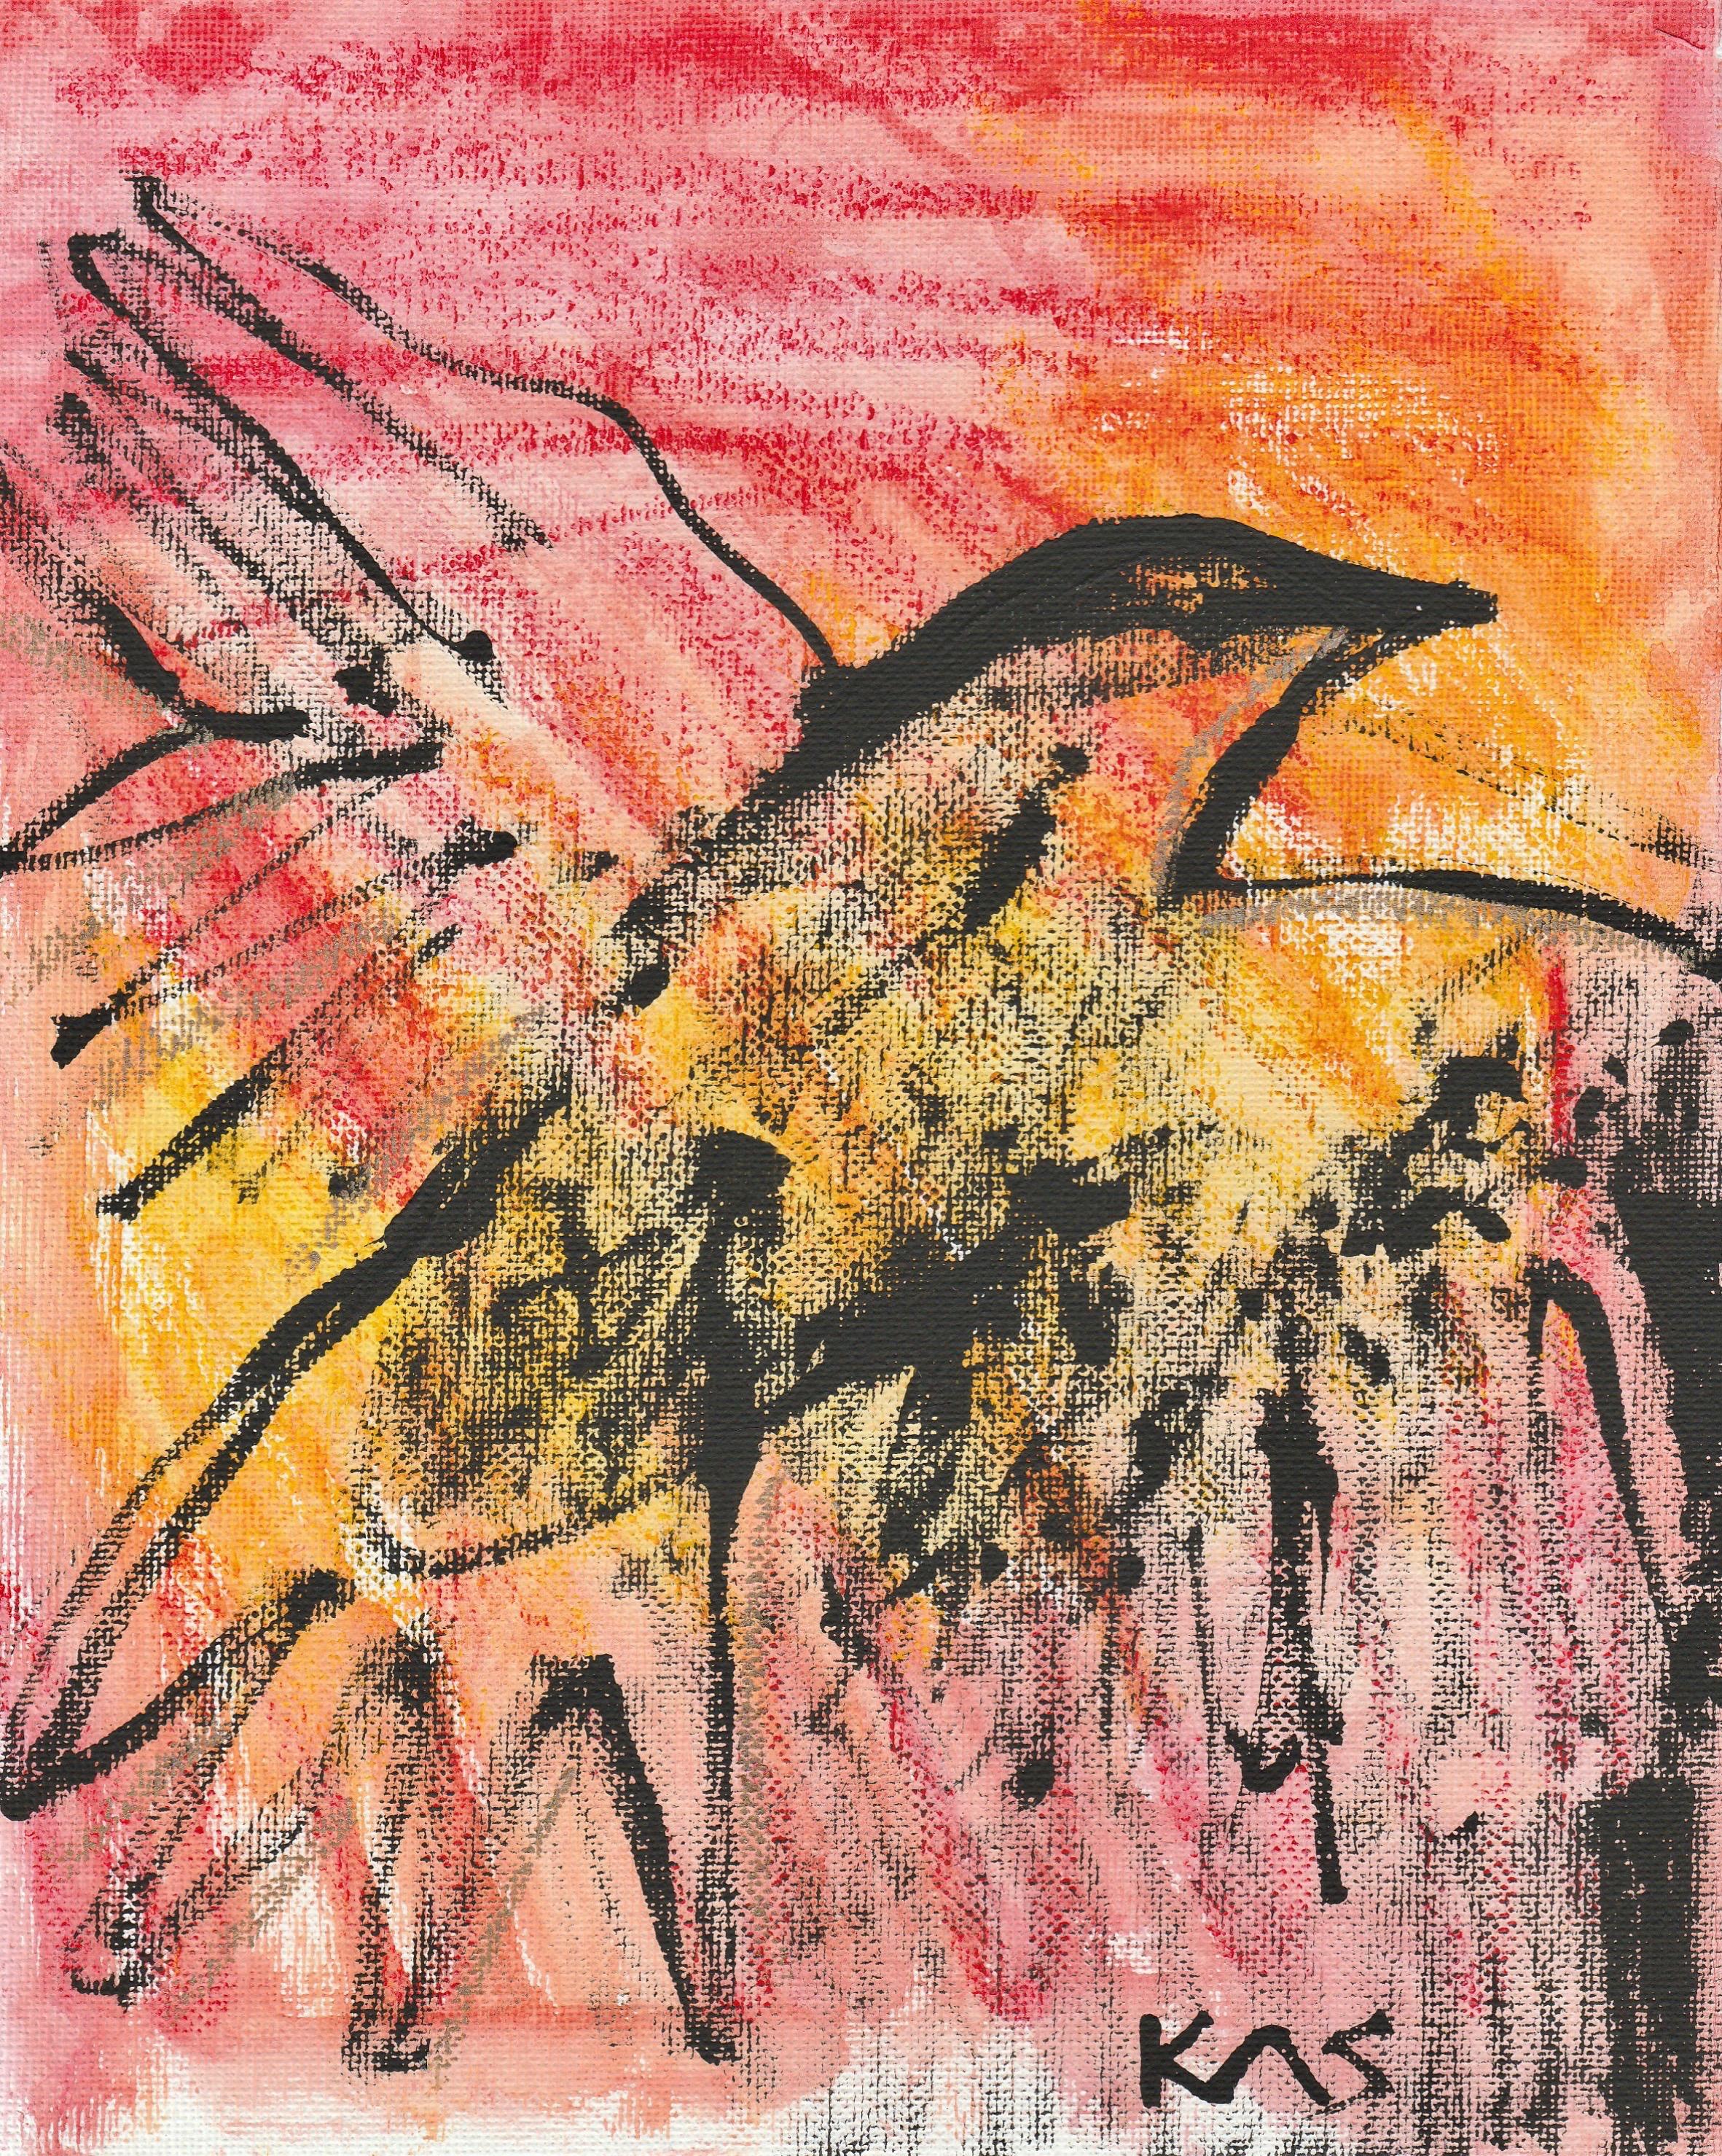 Crow by Kathryn Sturges